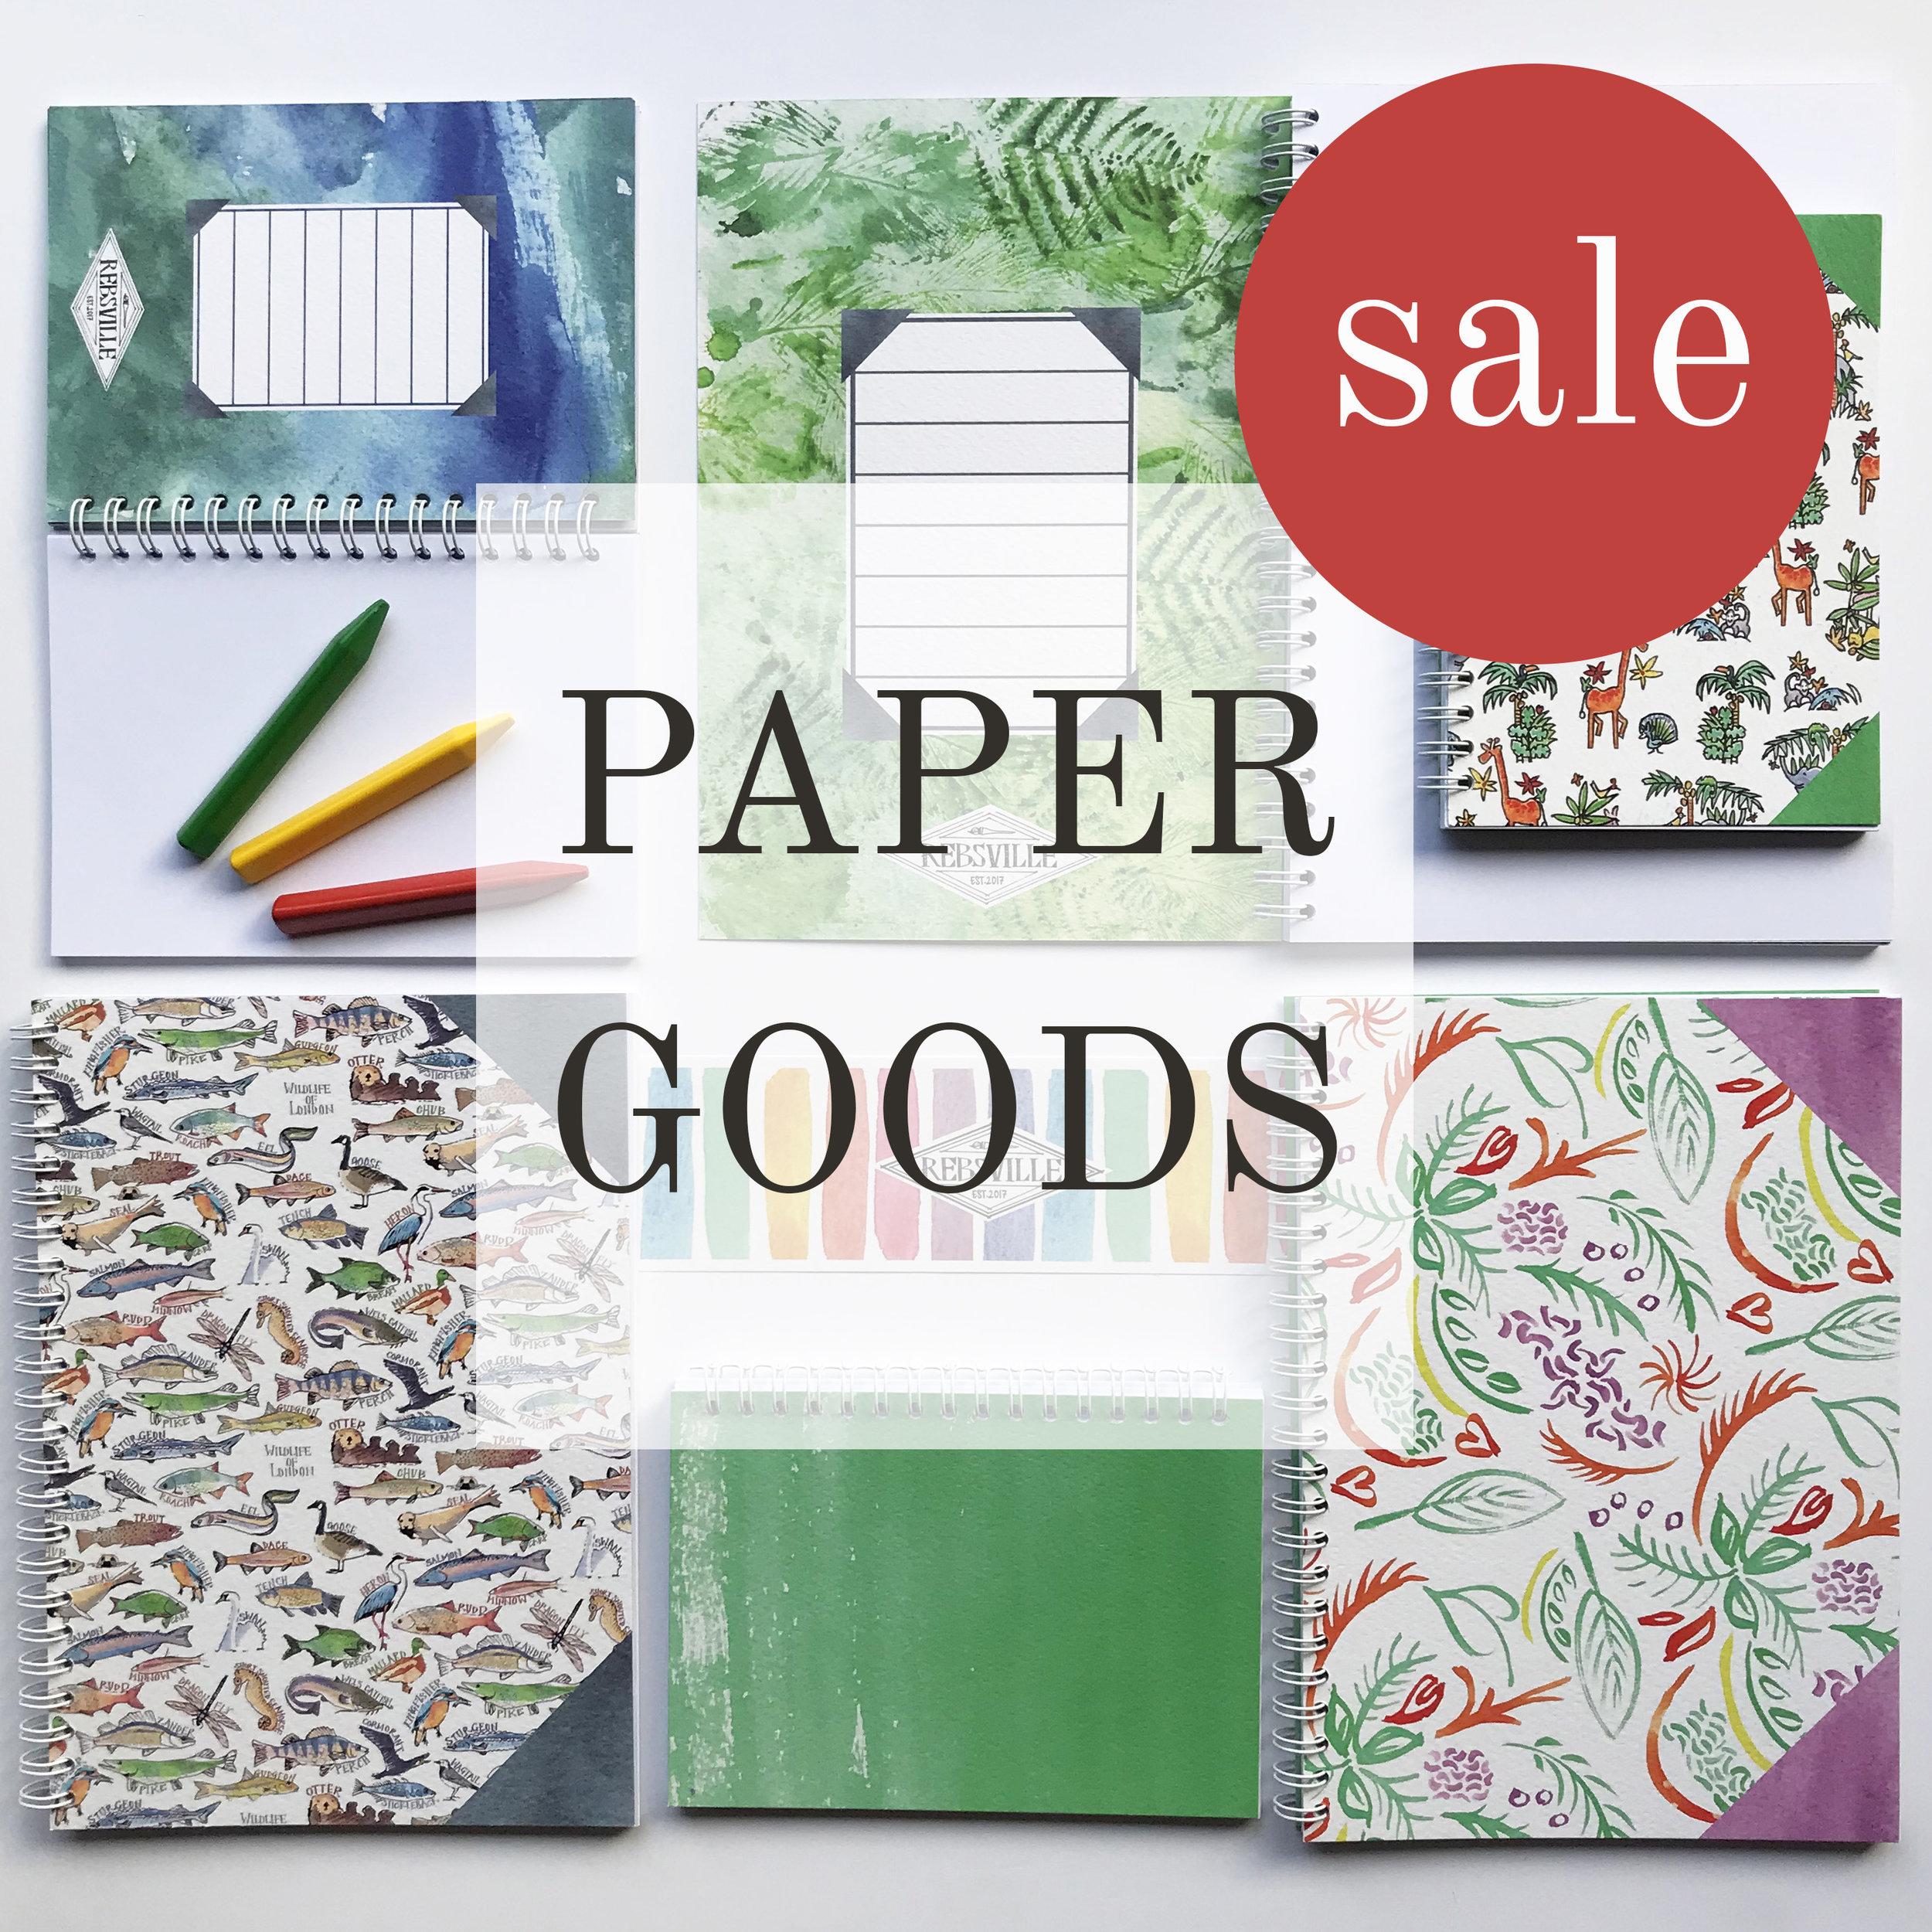 rebsville-art-design-shop-Paper=goods=sale.jpg